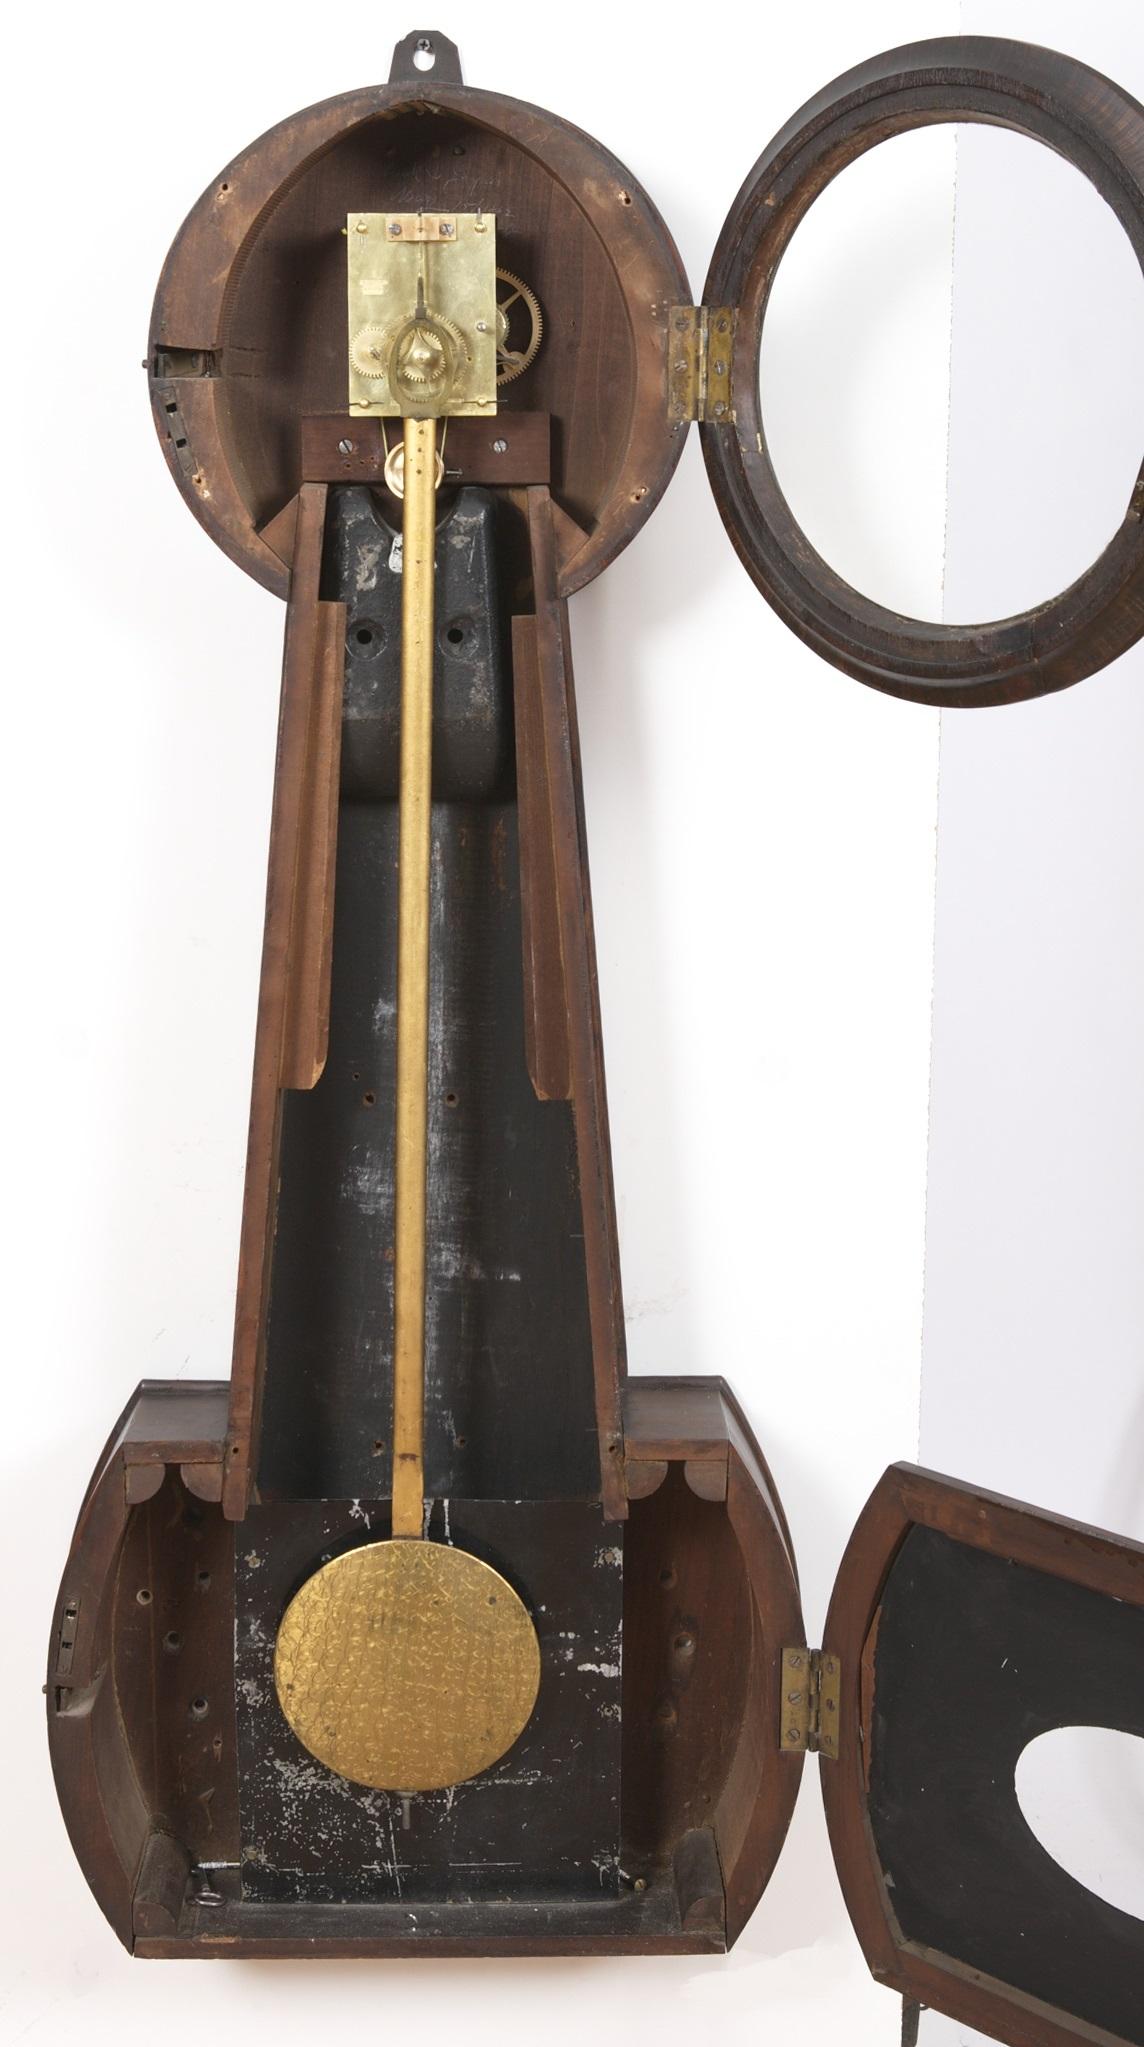 Howard Amp Davis 2 Regulator Banjo Clock For W H C Riggs